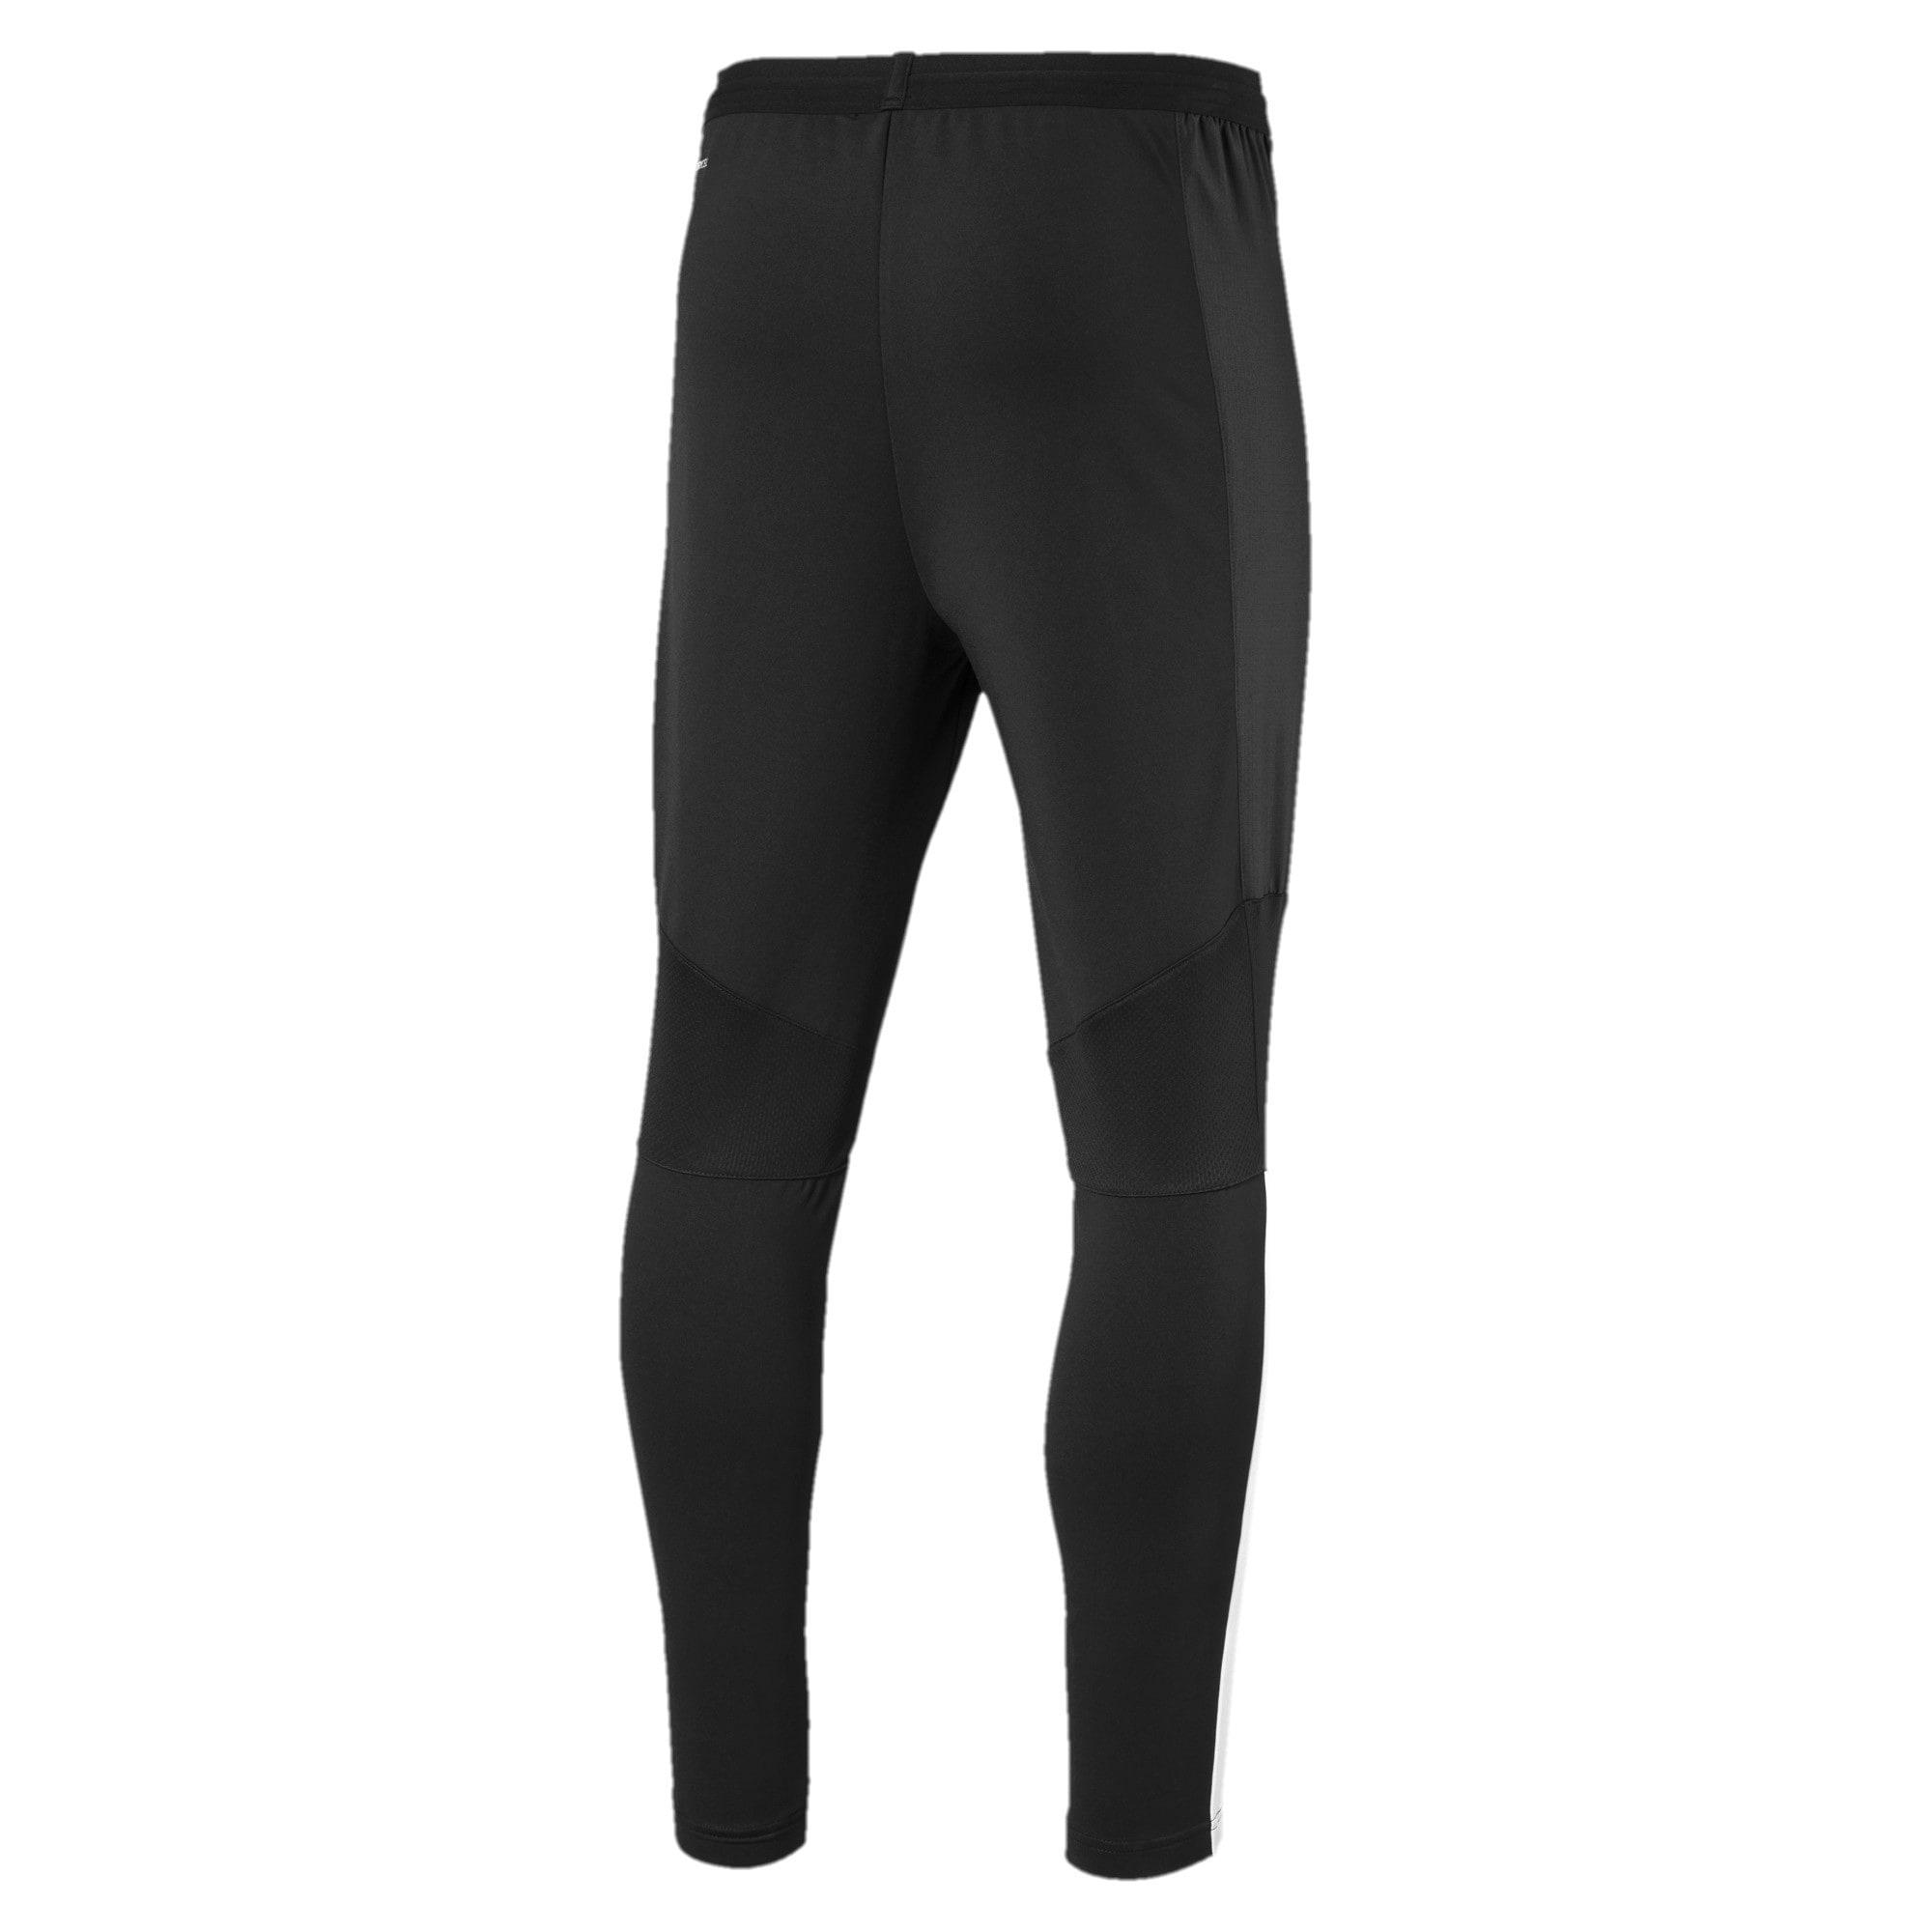 Thumbnail 2 of Valencia CF Men's Training Pants, Puma Black-Puma White, medium